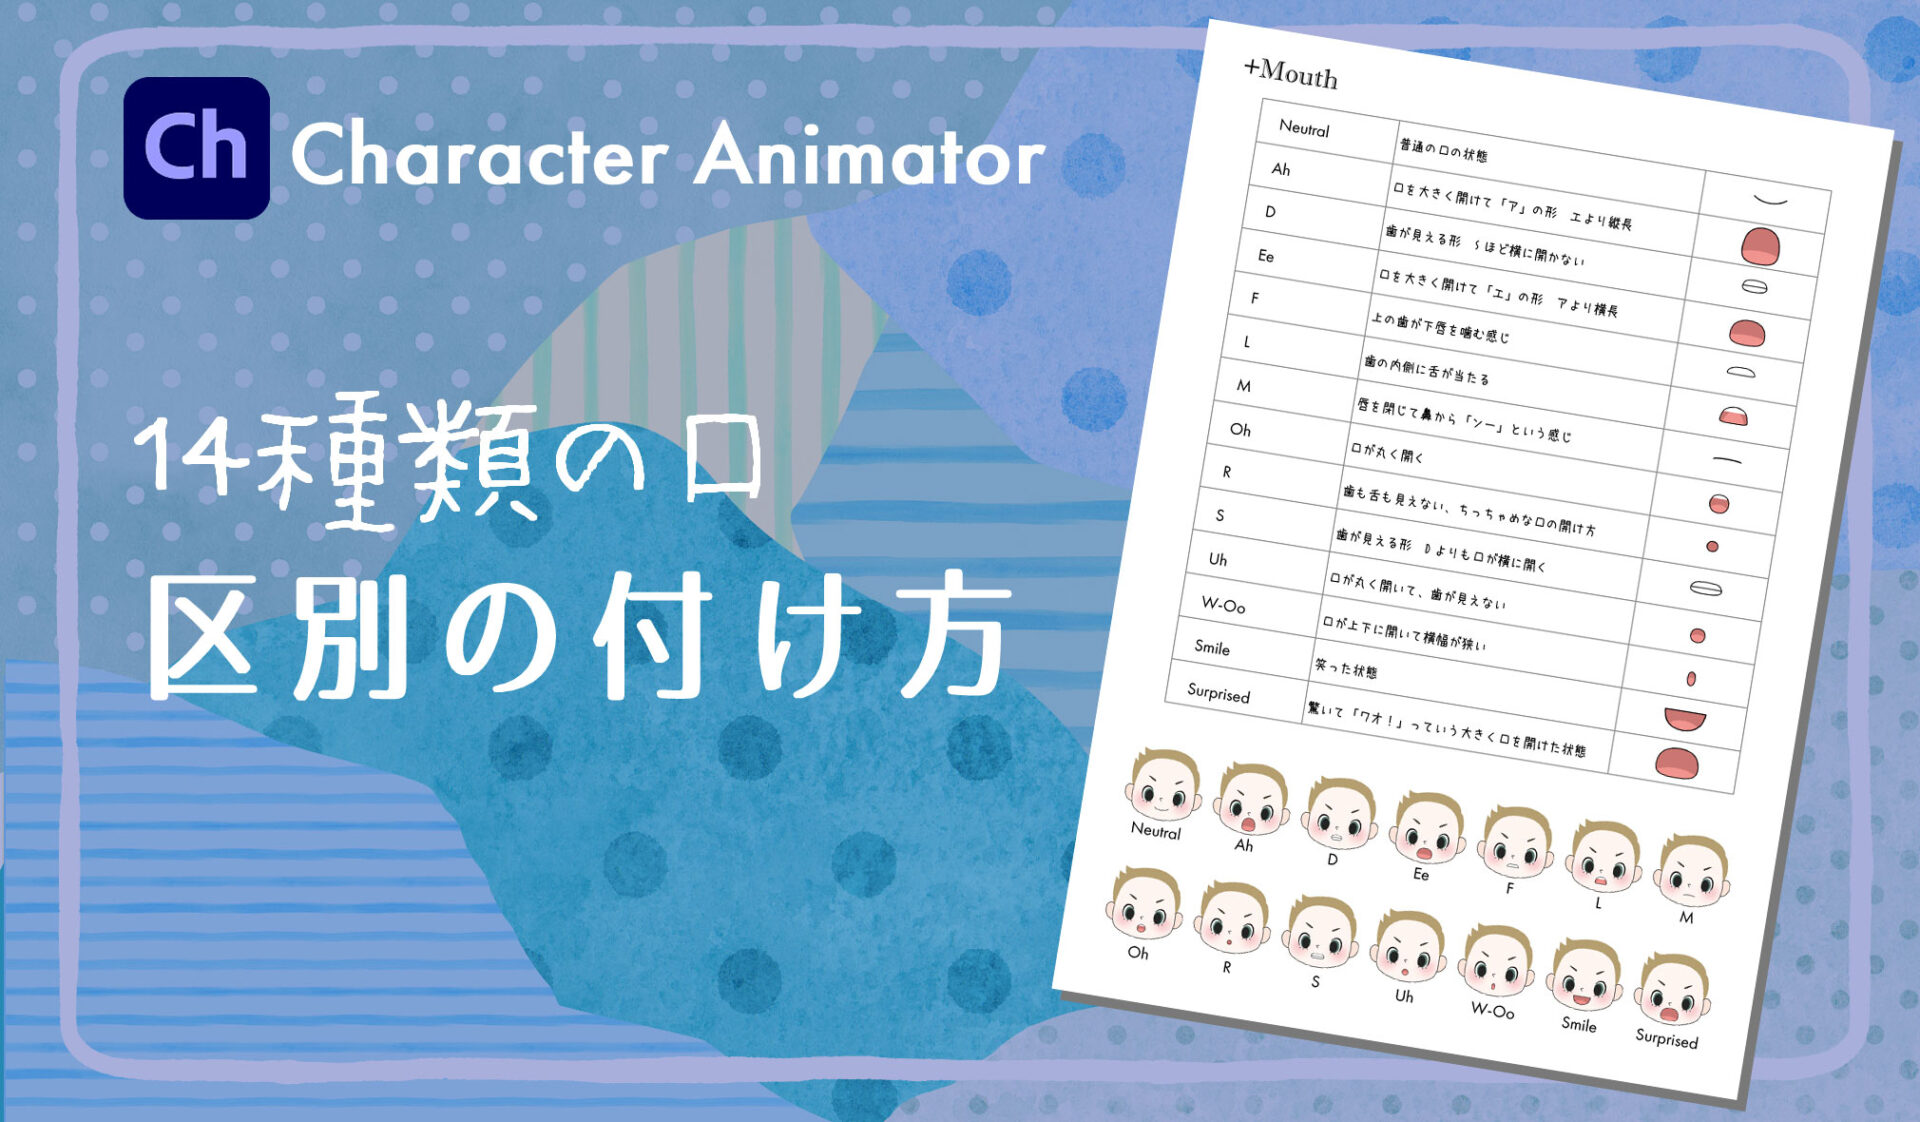 Adobe CharacterAnimator +Mouth 早見表